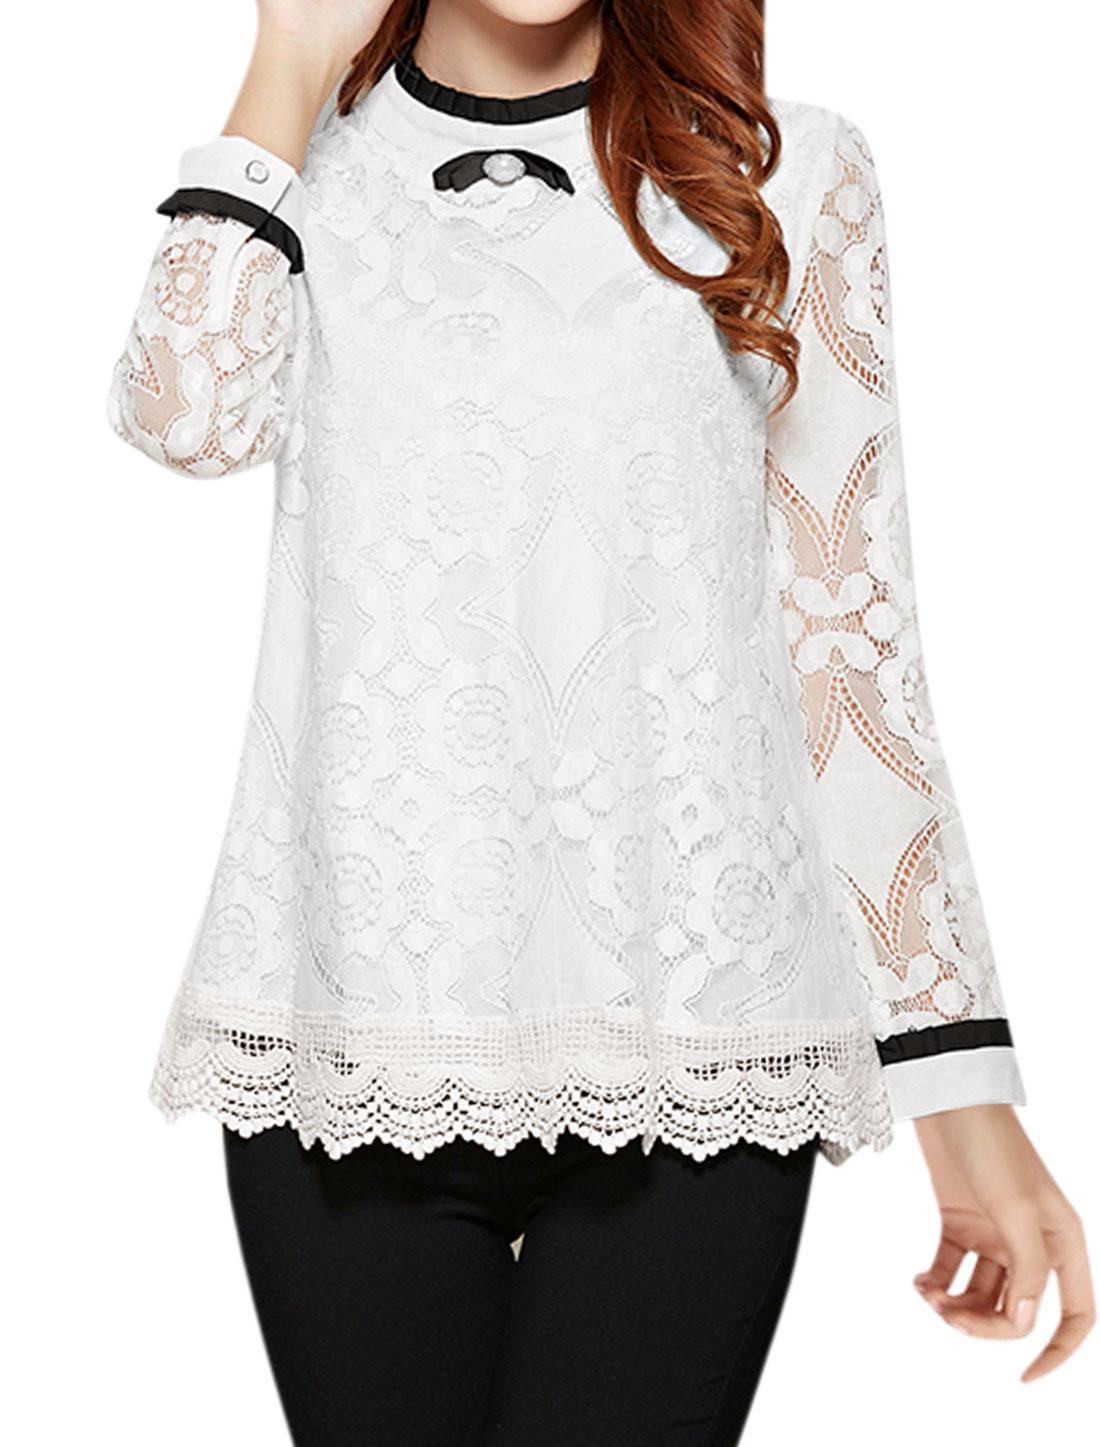 Women Bowknot Decor Crochet Panel Semi Sheer Lace Blouse White M